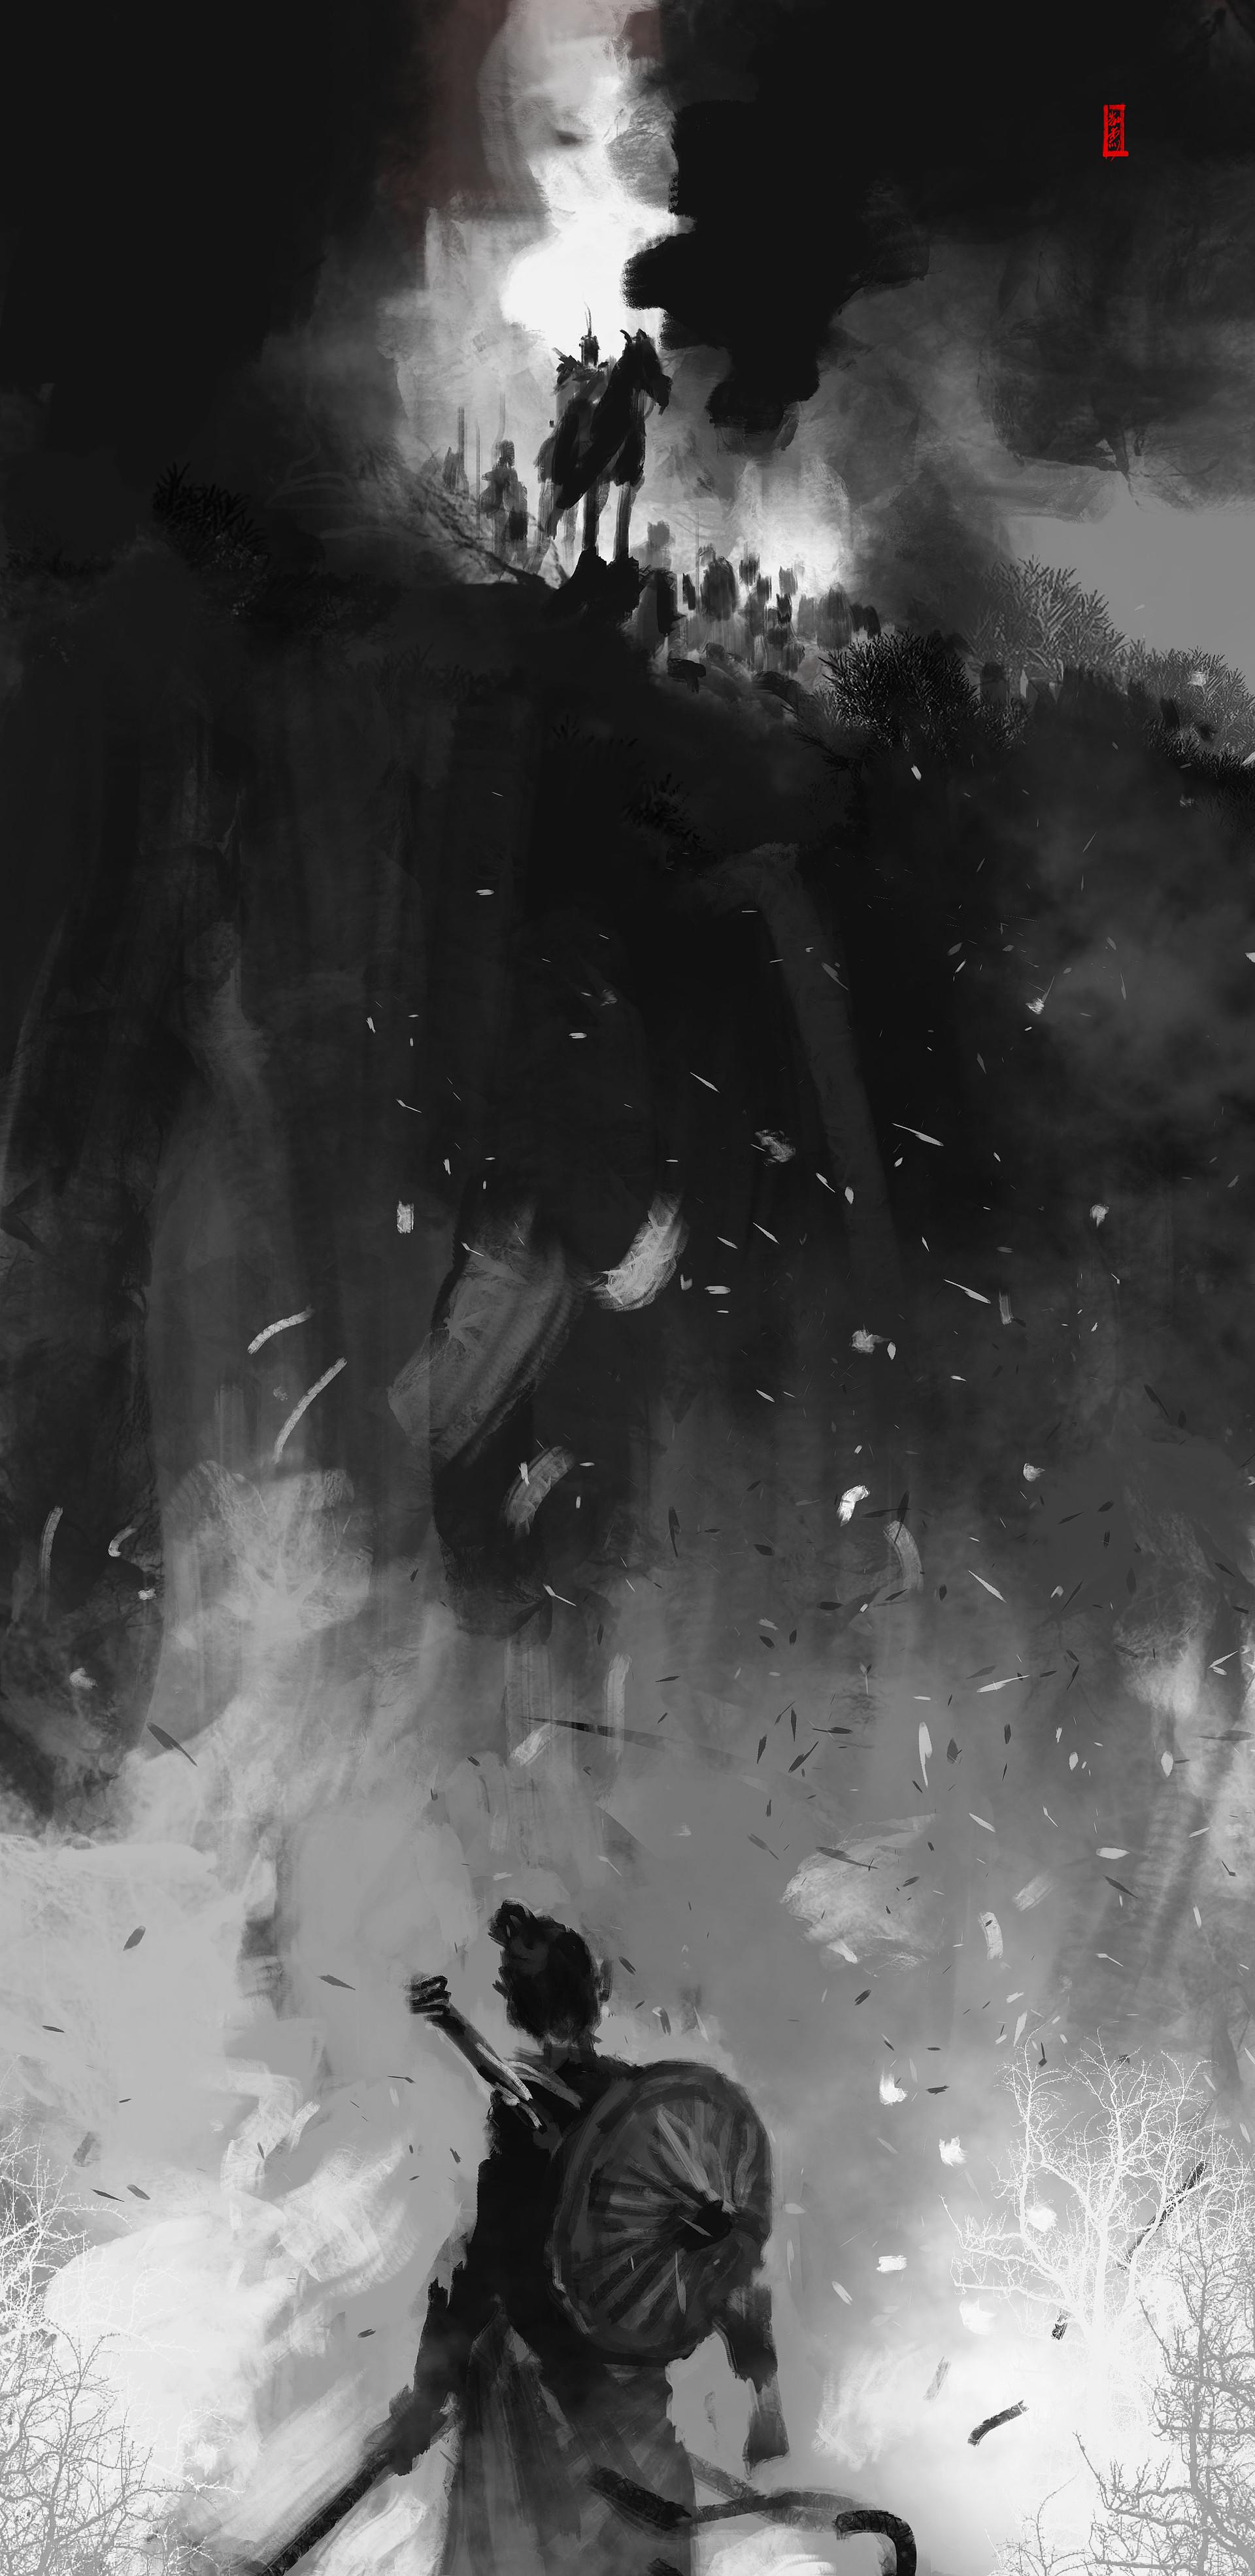 ArtStation - The night, KAIJIE HUANG